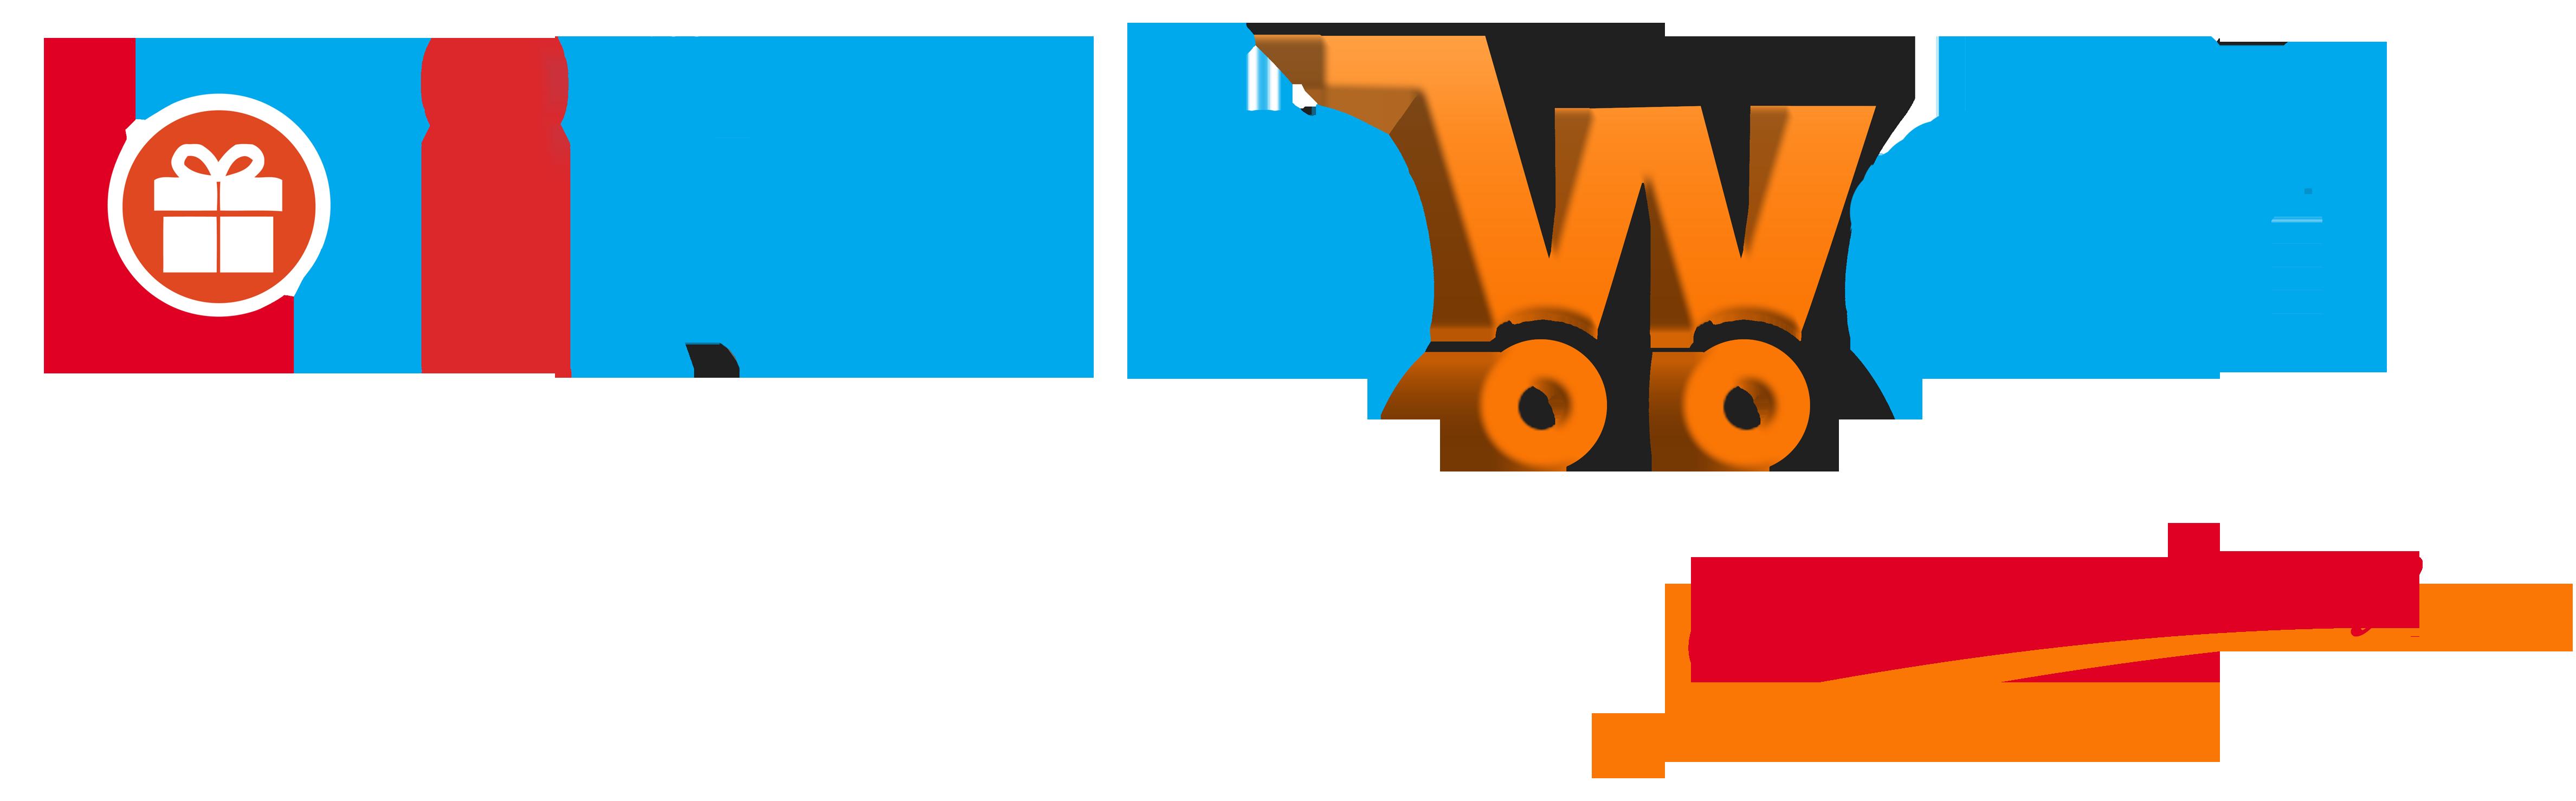 iRabwah